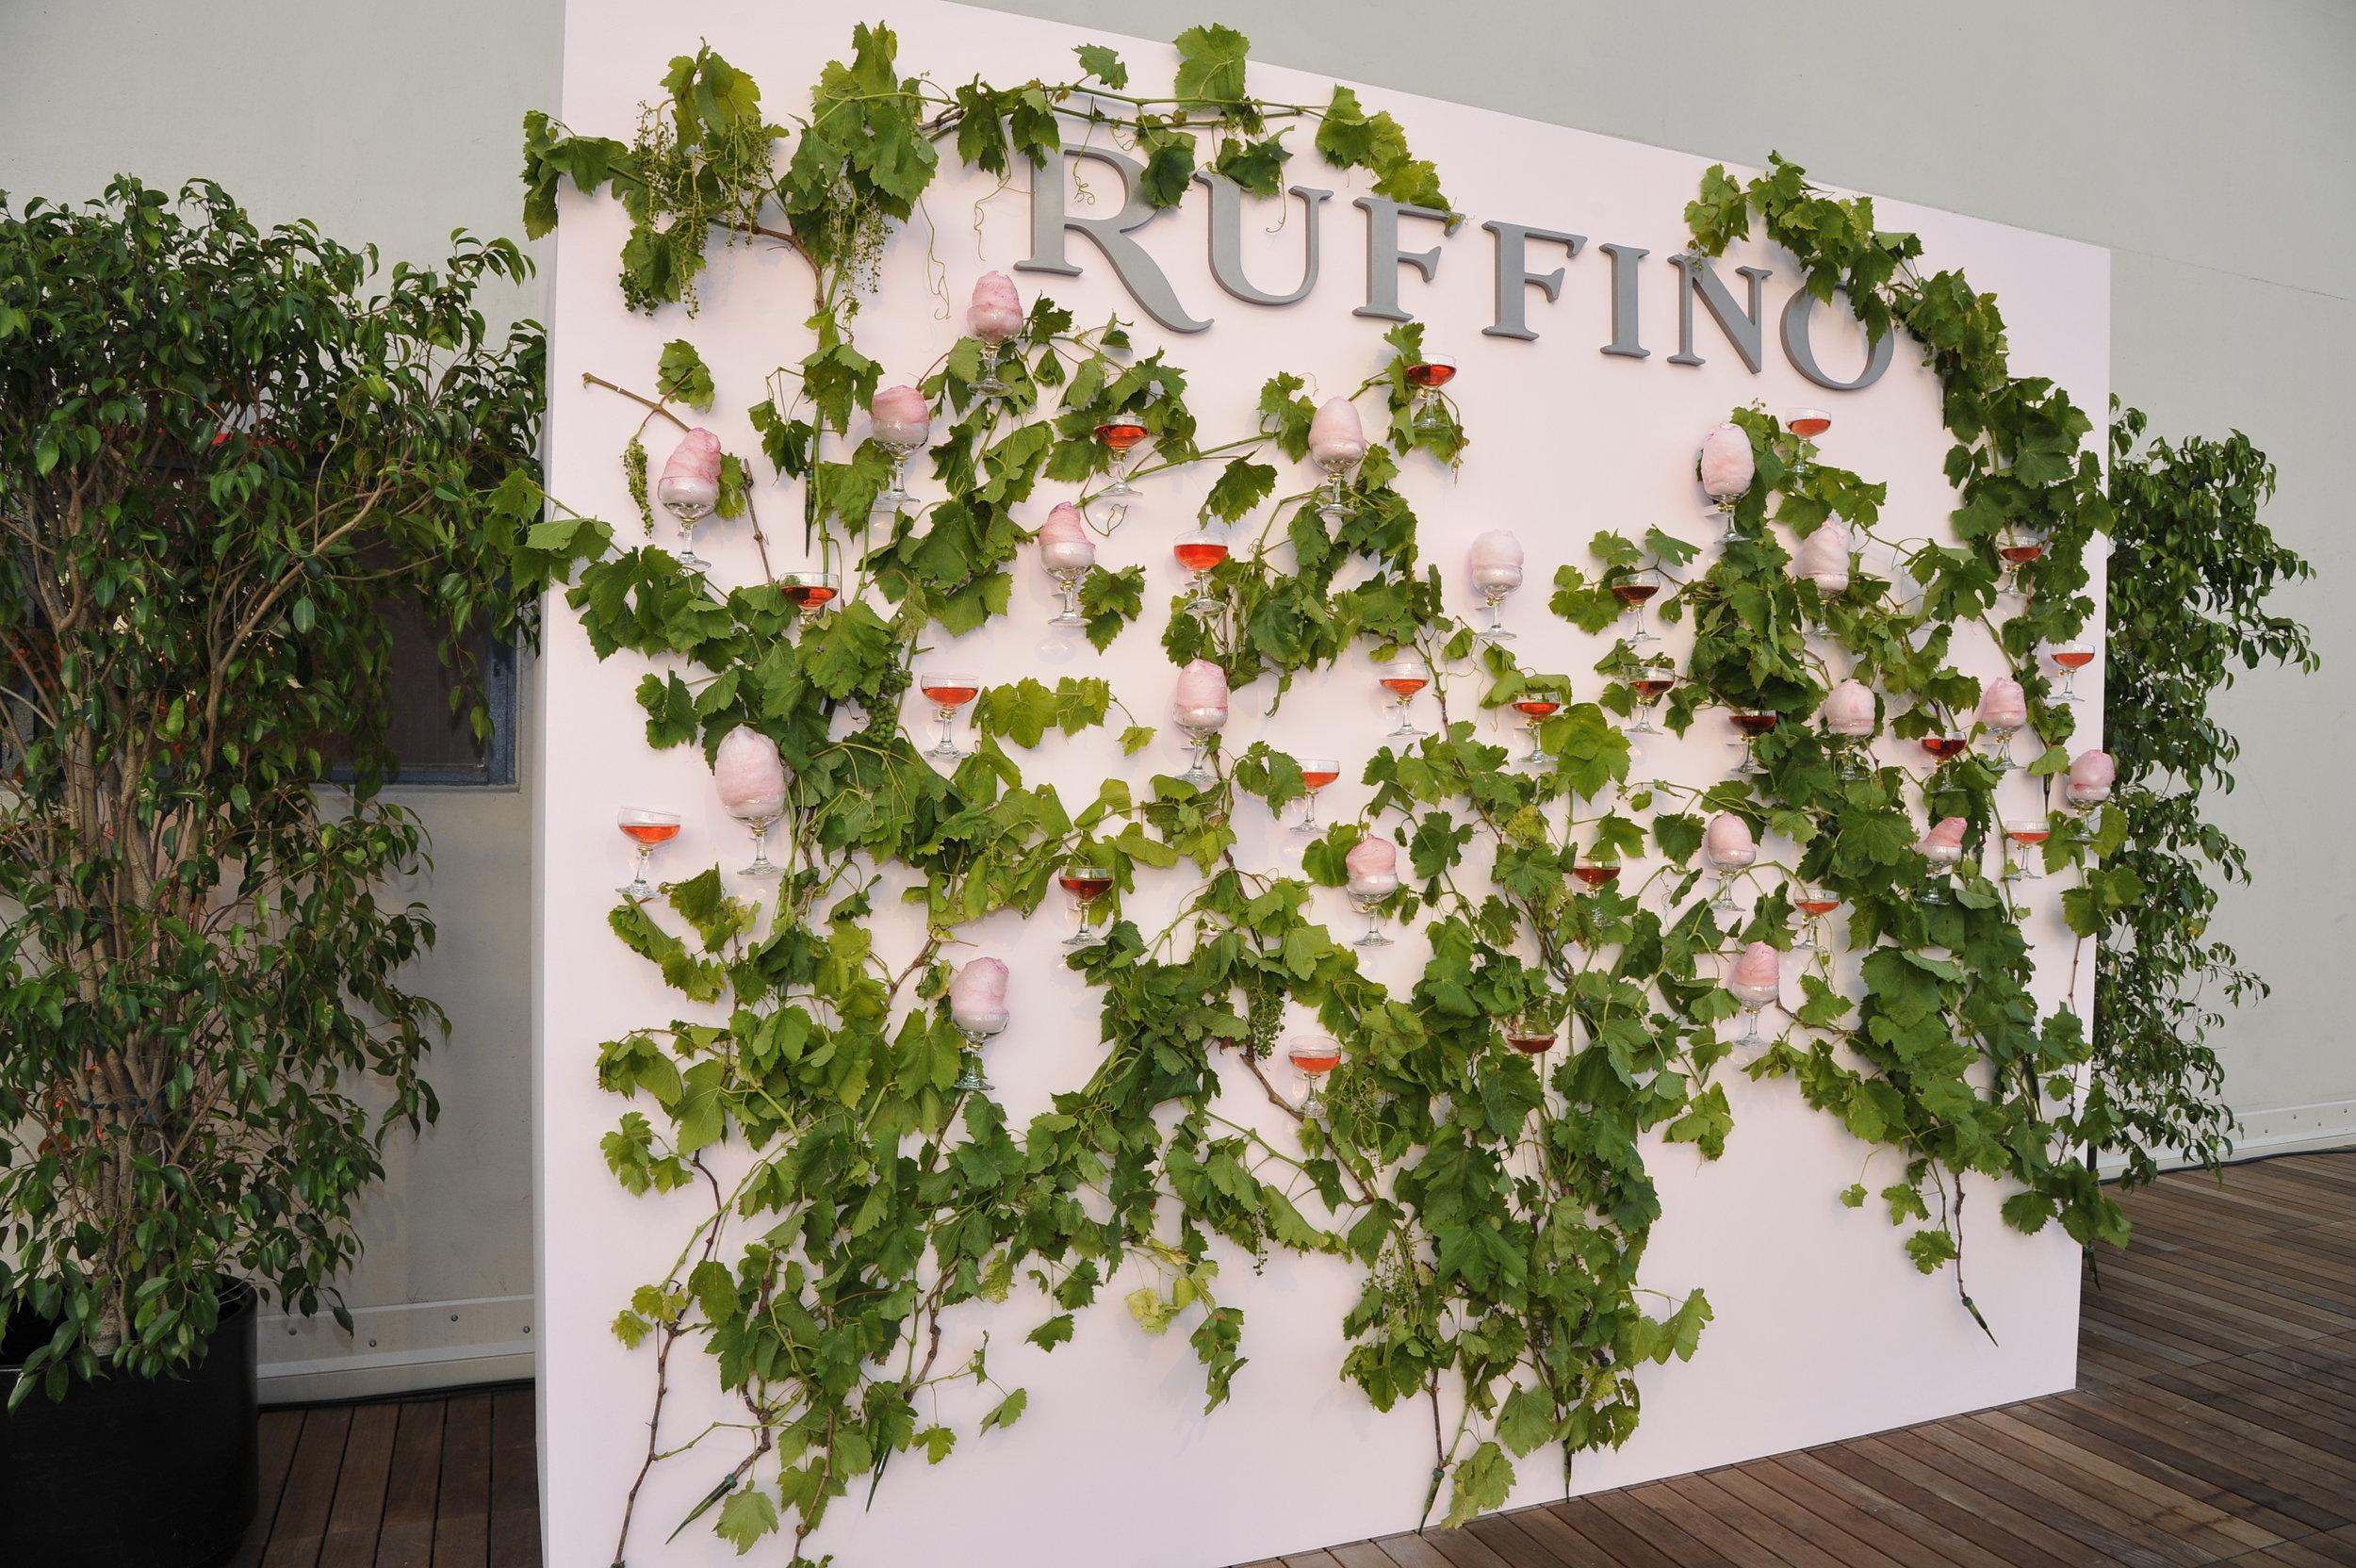 Ruffino Sparking Rosé Launch